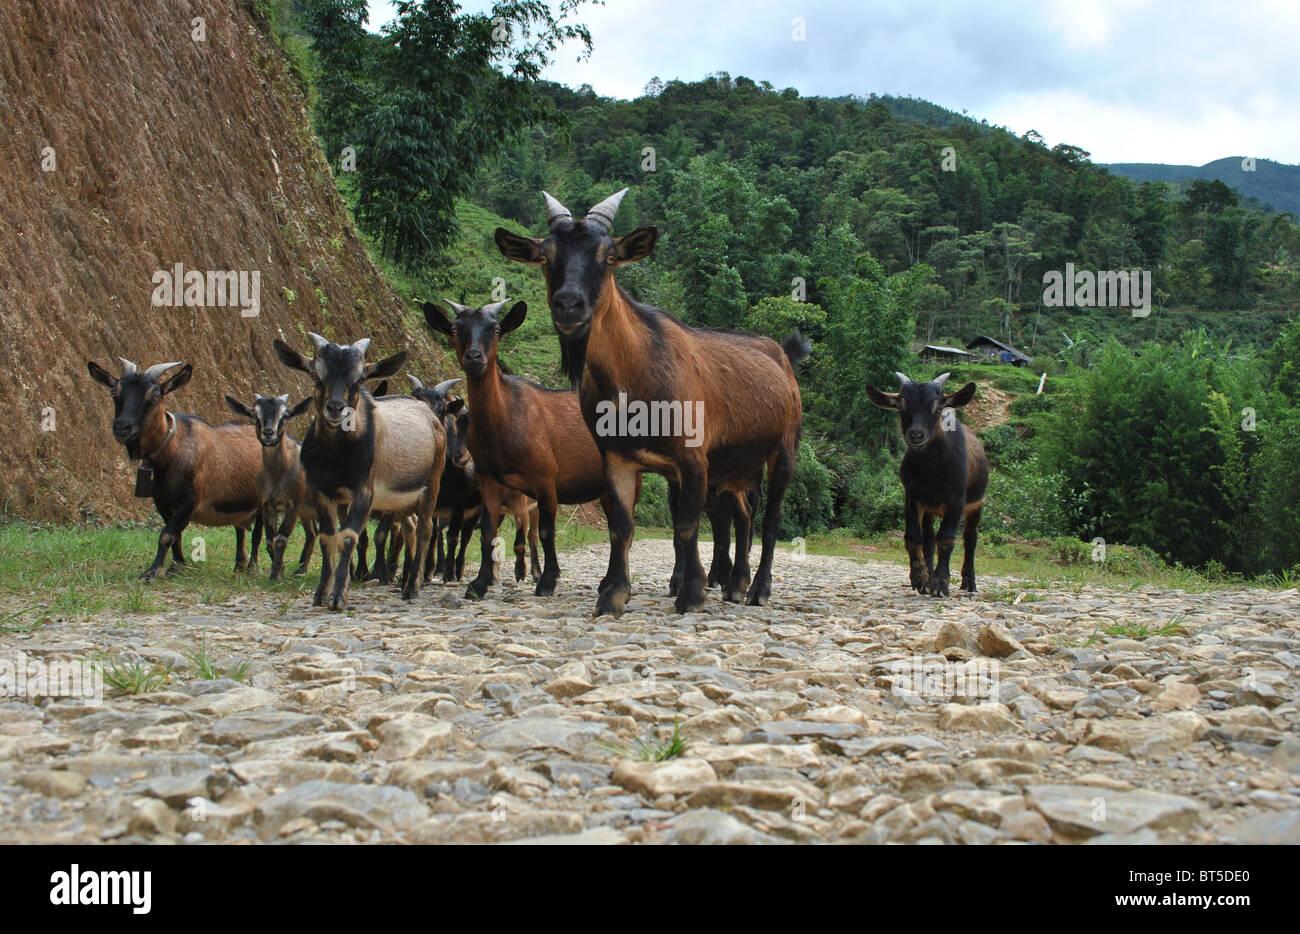 Herd of goats on a mountain path near Sapa, Vietnam - Stock Image